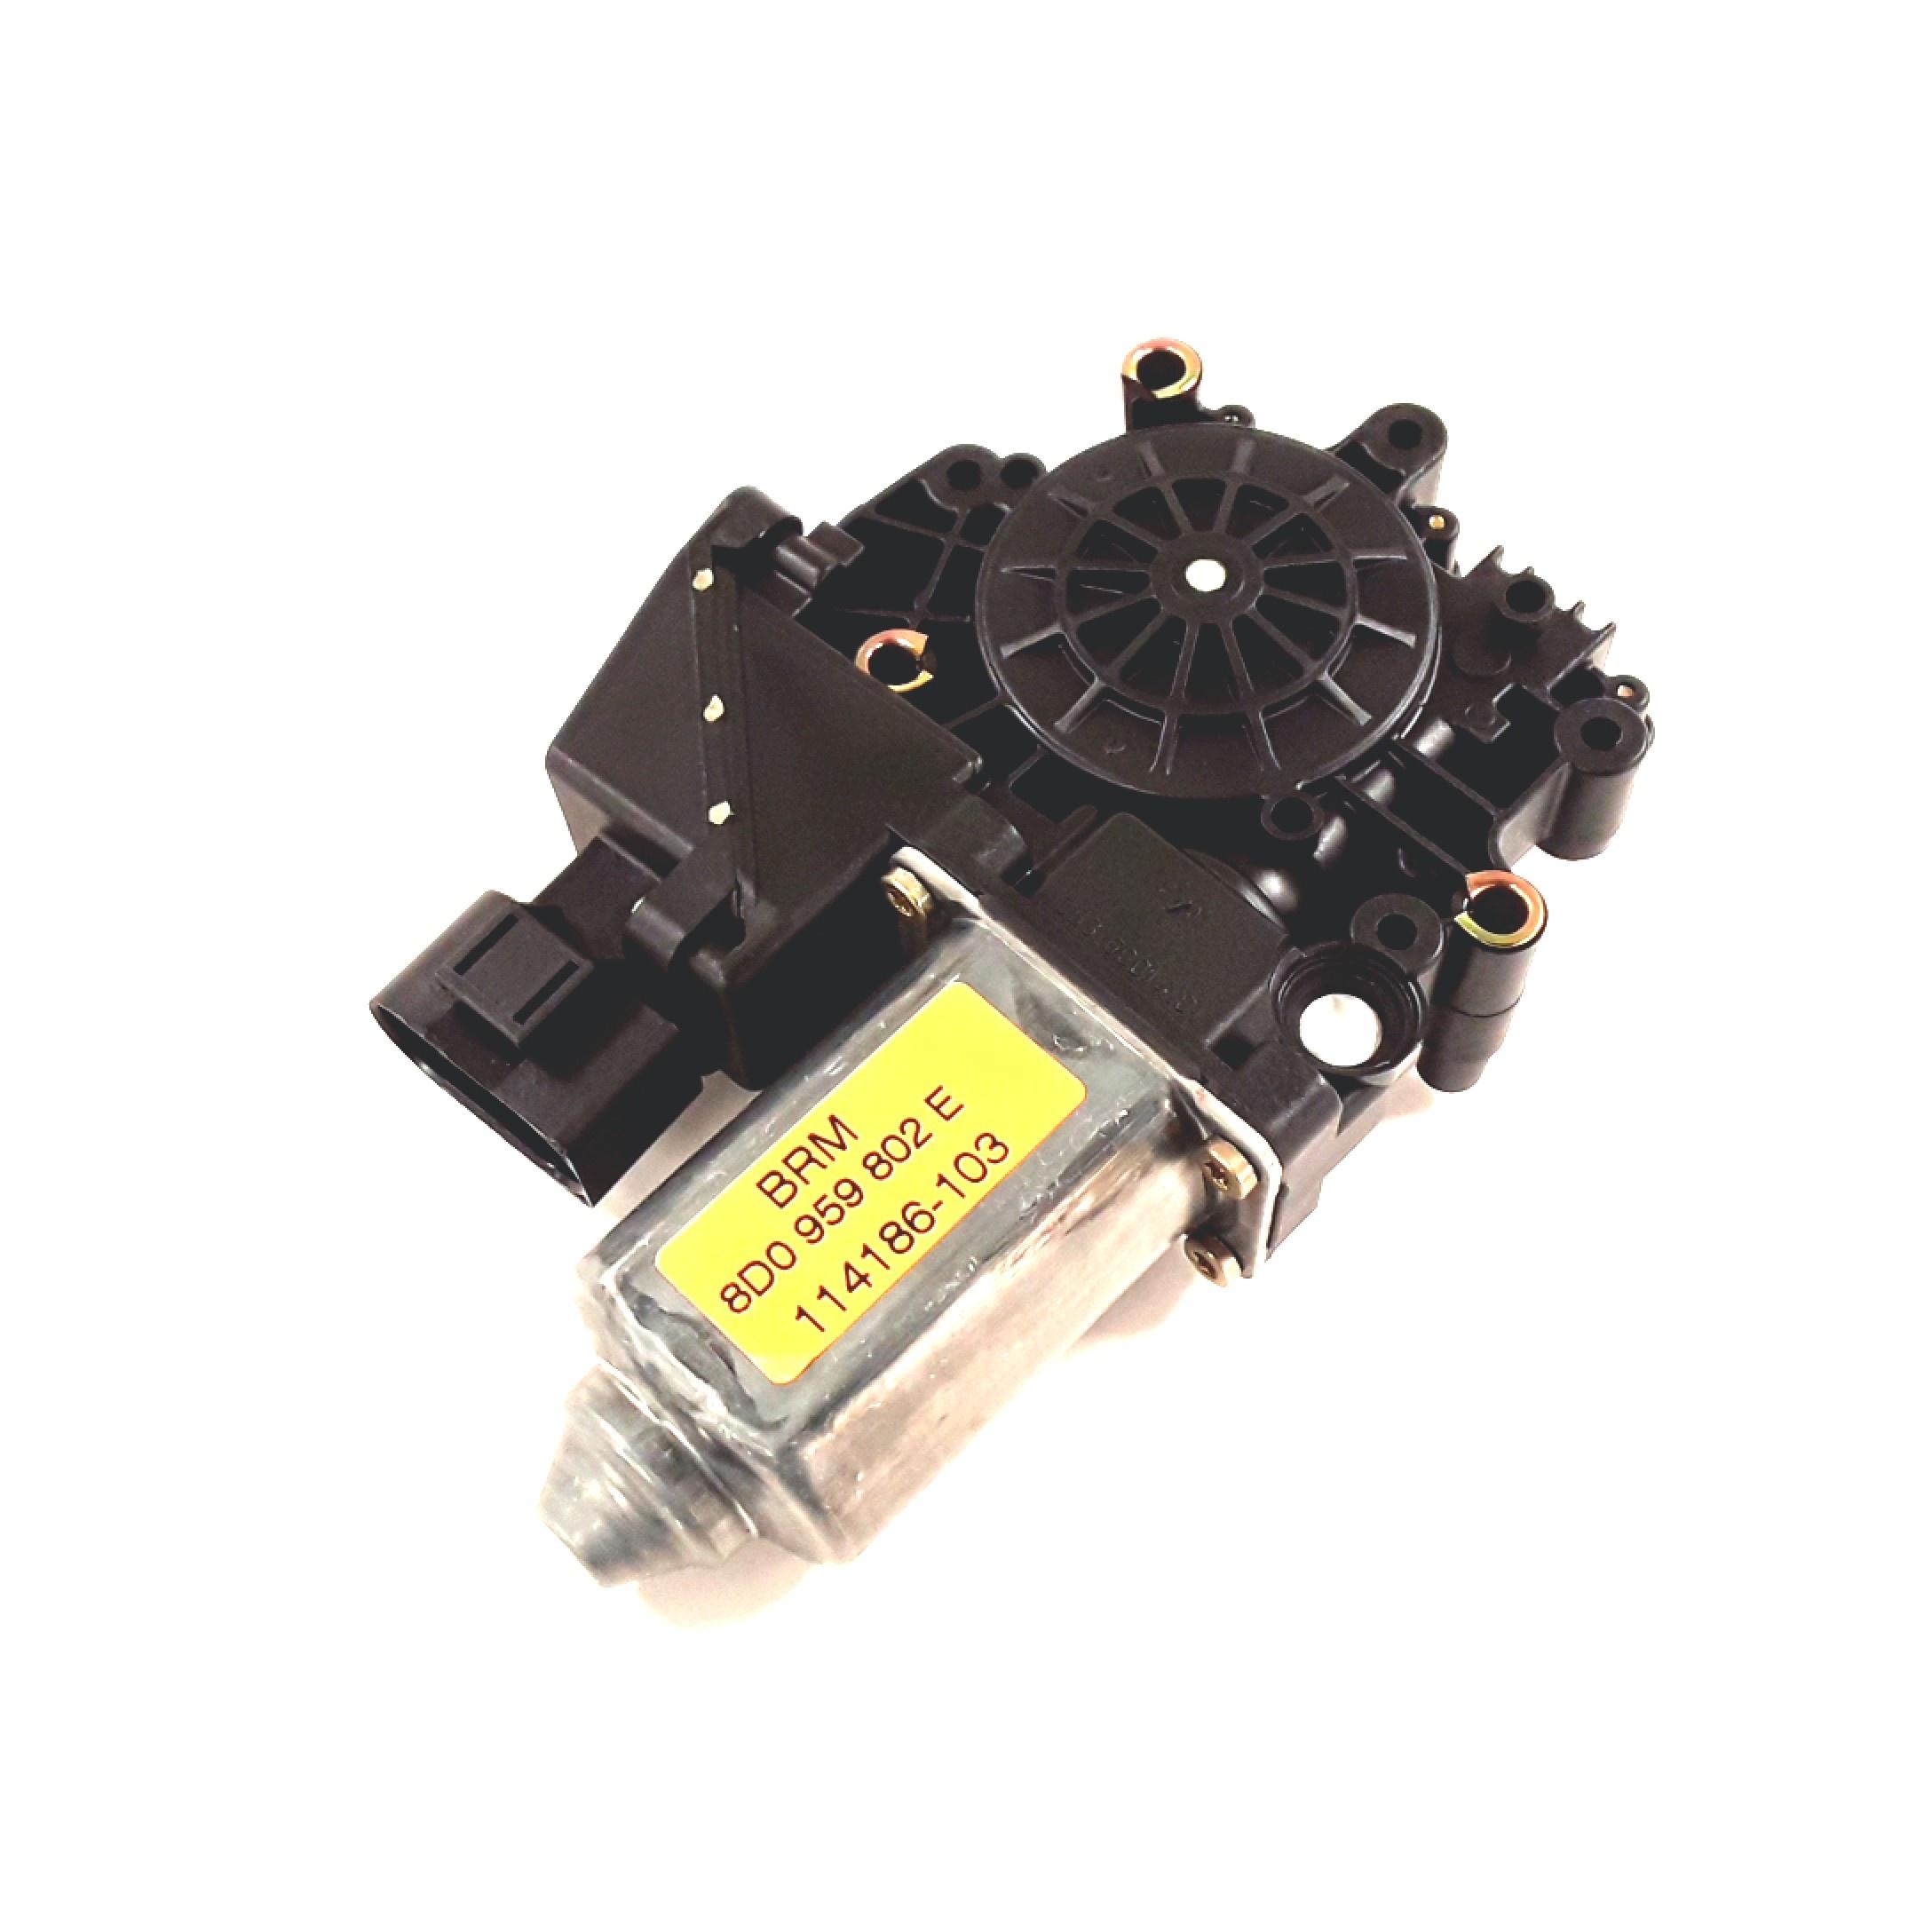 8d0959802e audi window lifter motor audi right avant for Electric motor winder jobs in saudi arabia